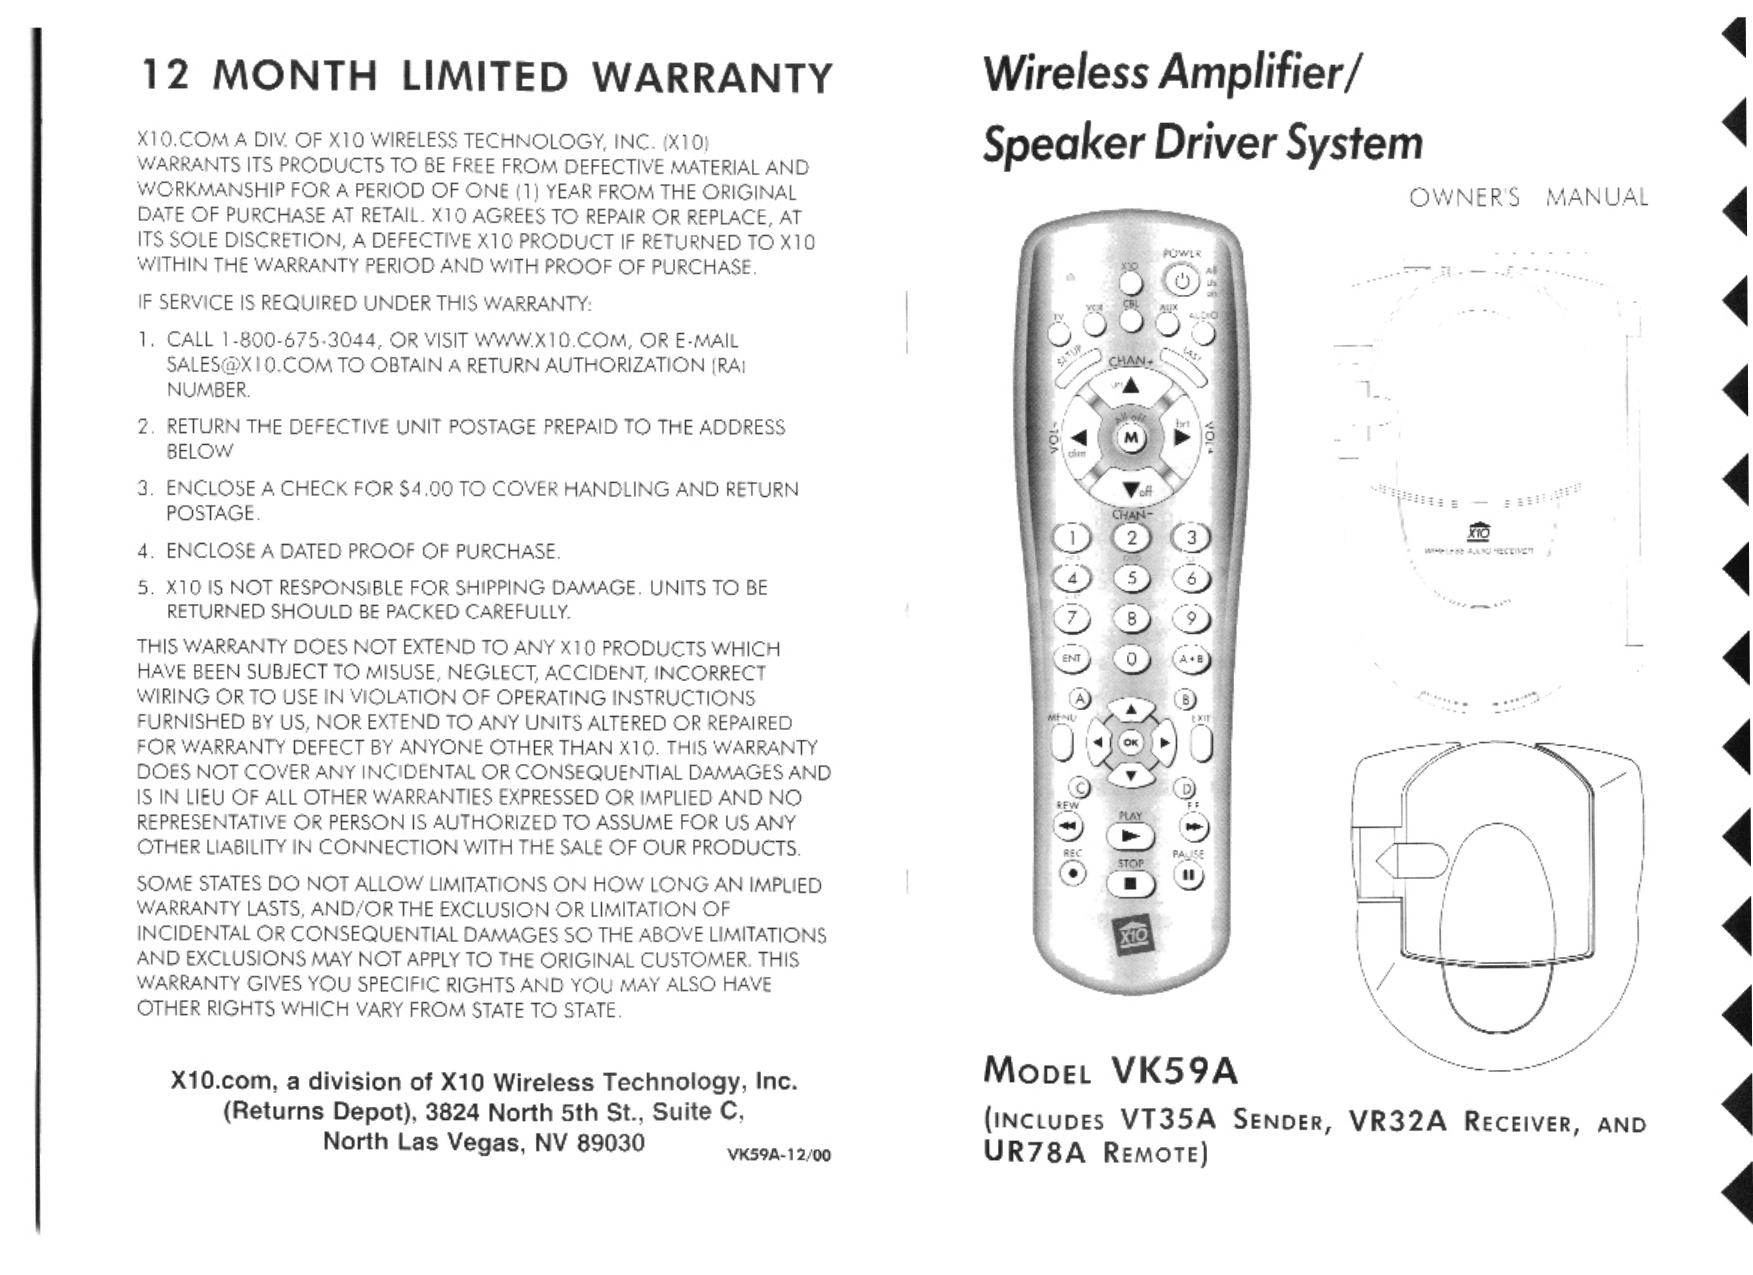 pdf for X10 Speaker VK59A manual